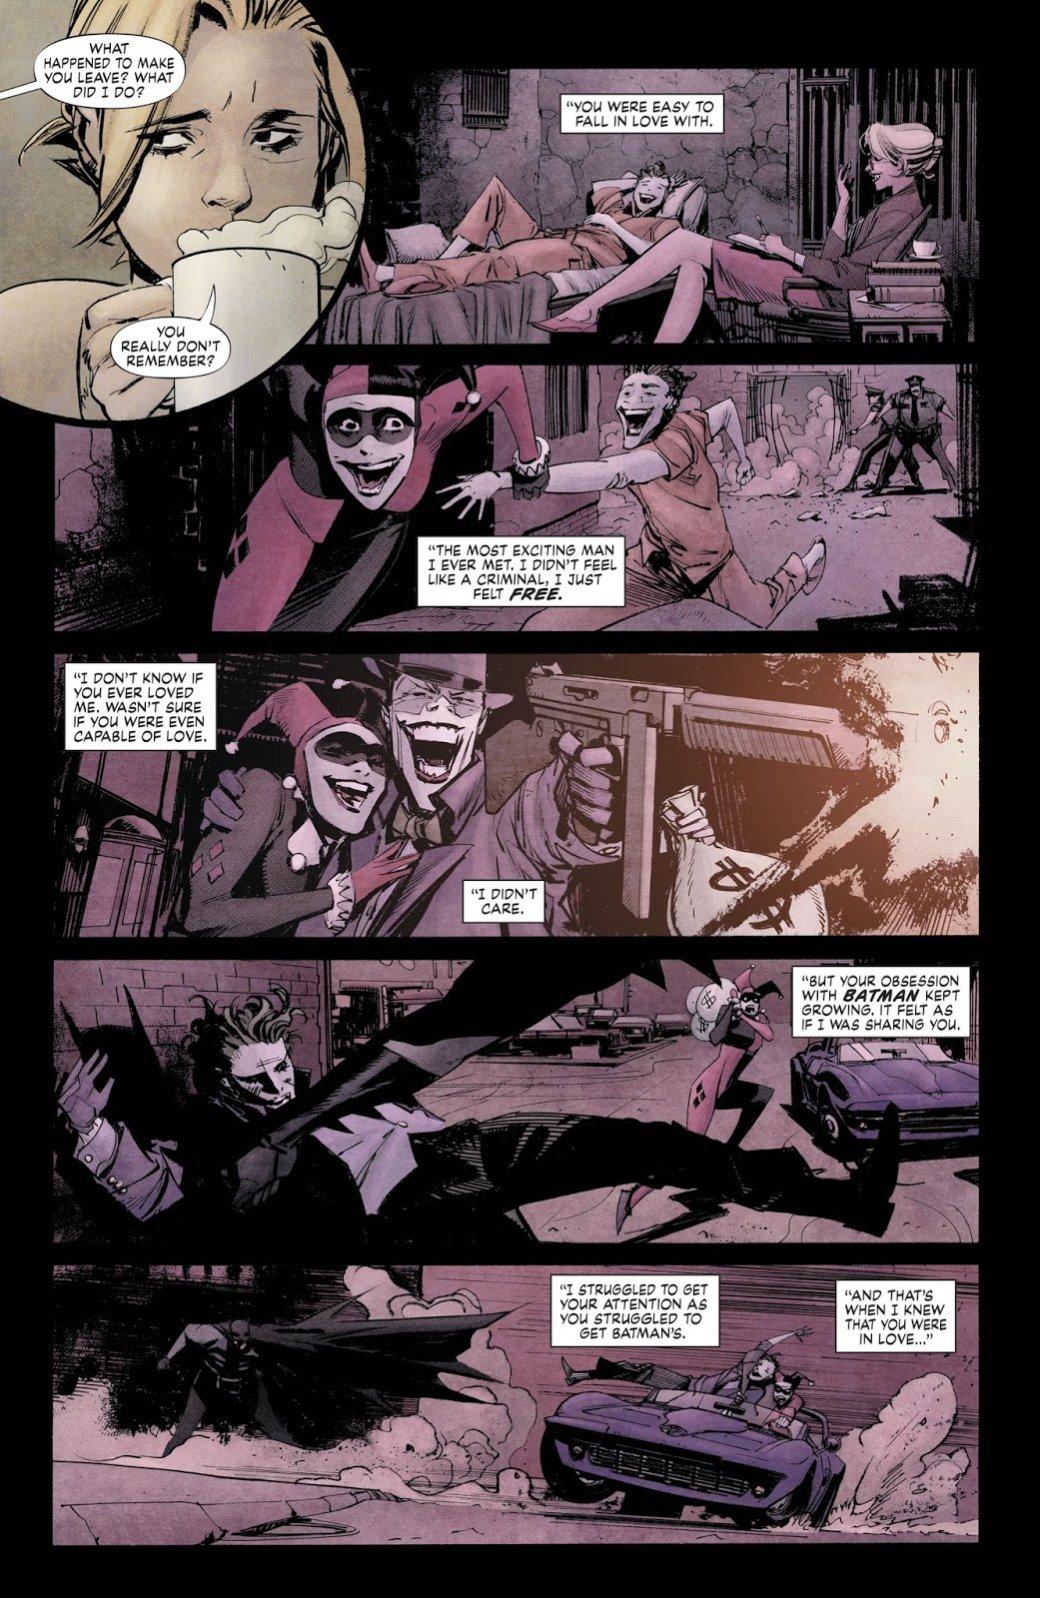 Открытия 2017— комиксы: Star-Lord, Infamous Iron Man, Batman: The White Knight. - Изображение 11